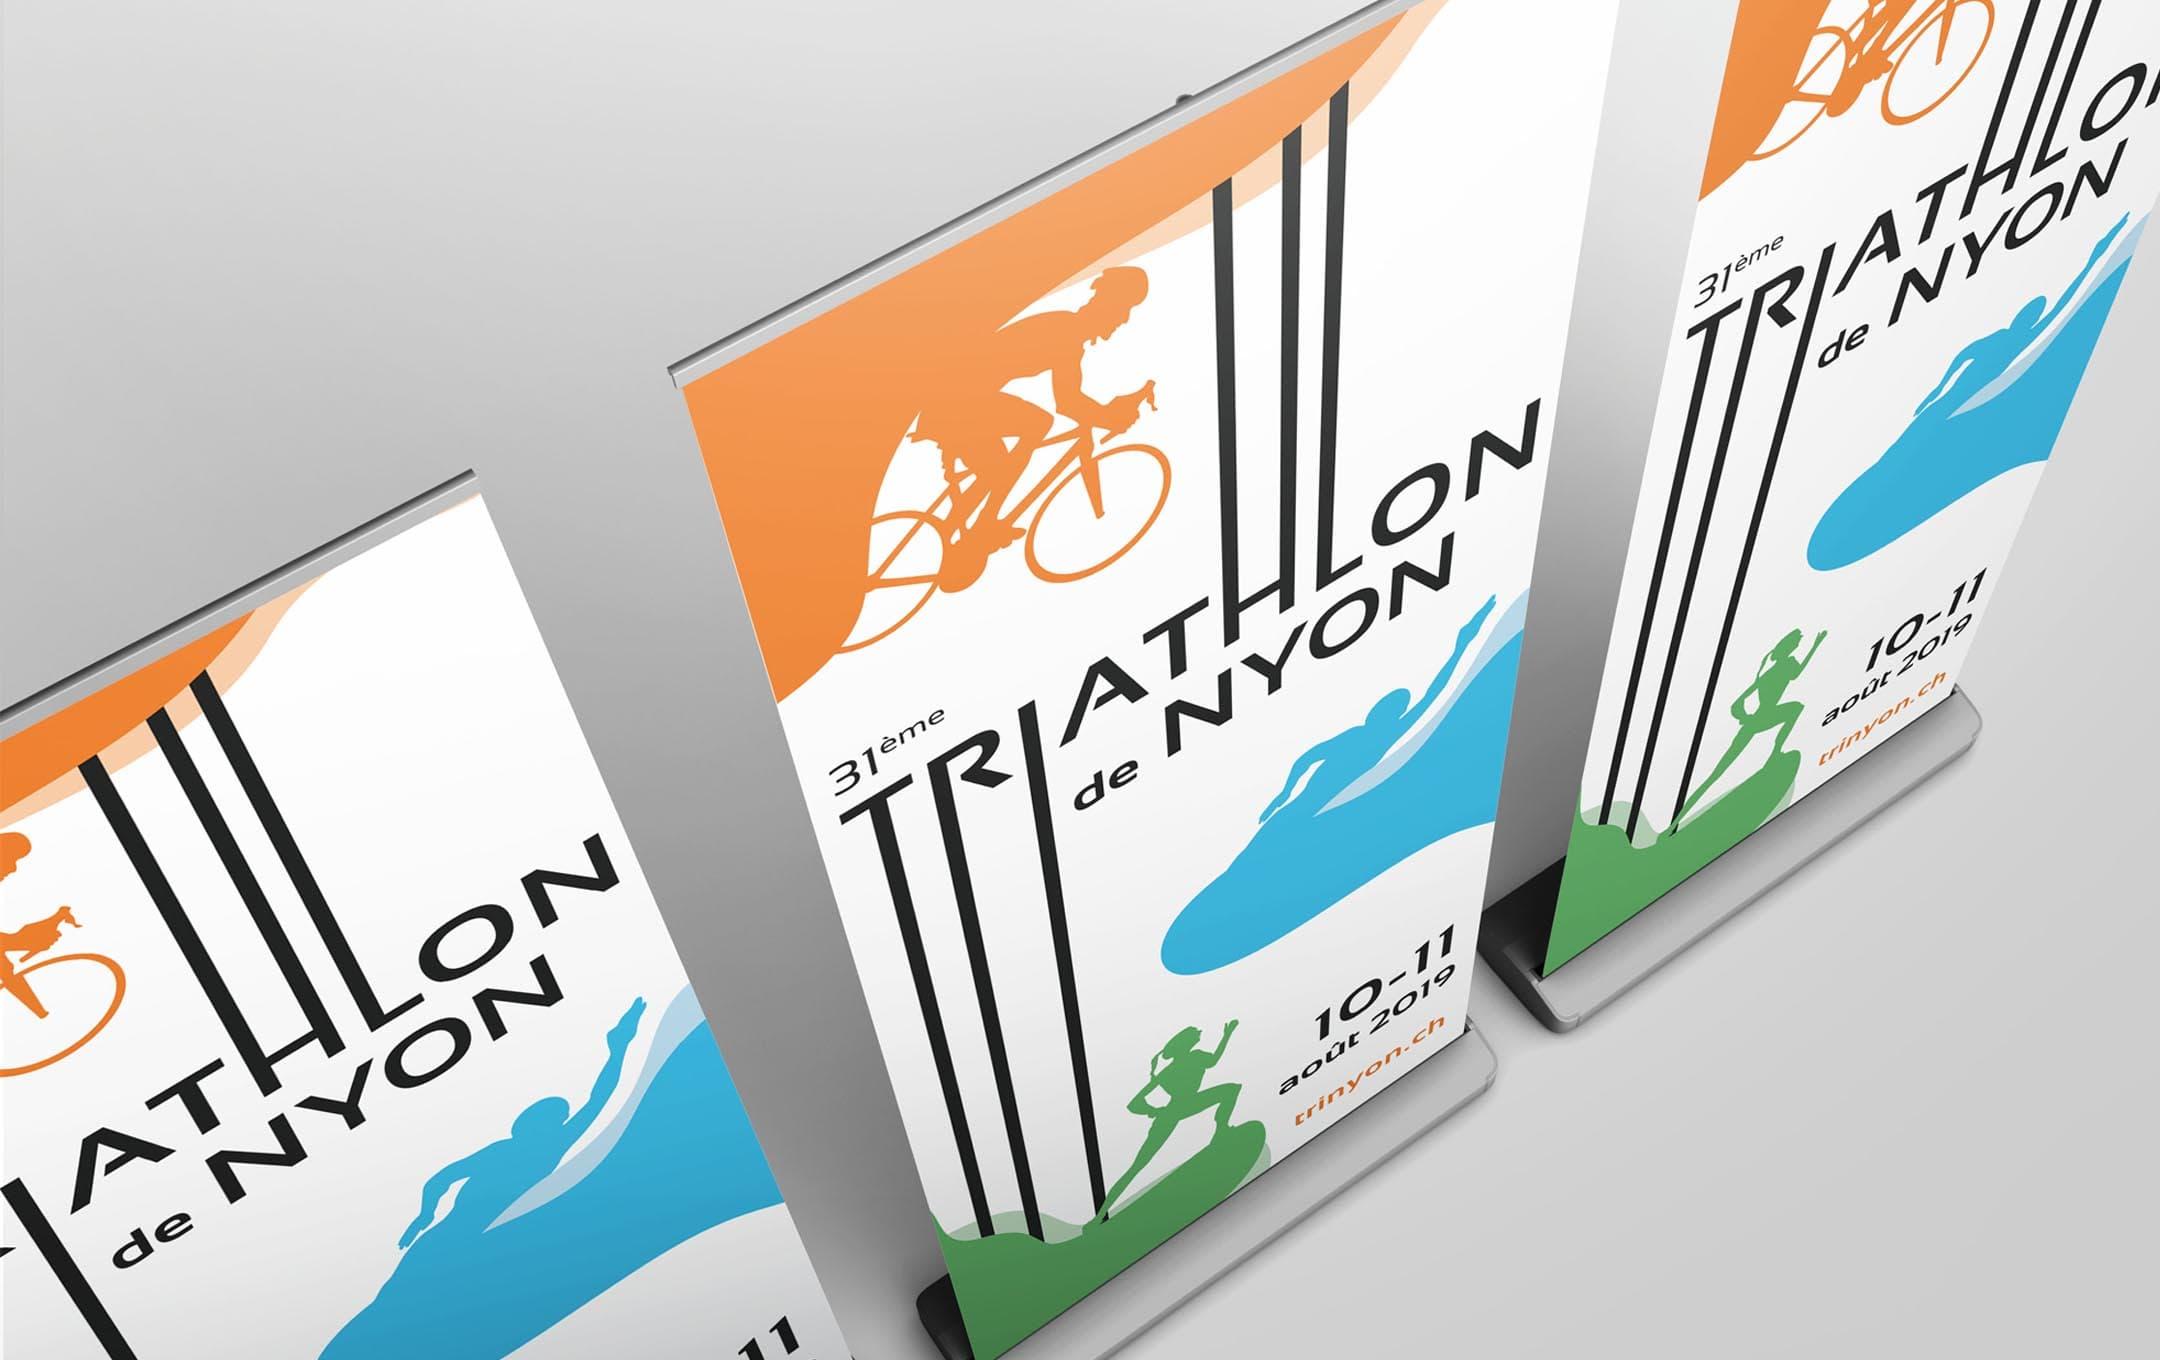 Habefast Etude De Cas Triathlon Nyon Print Kakemonos